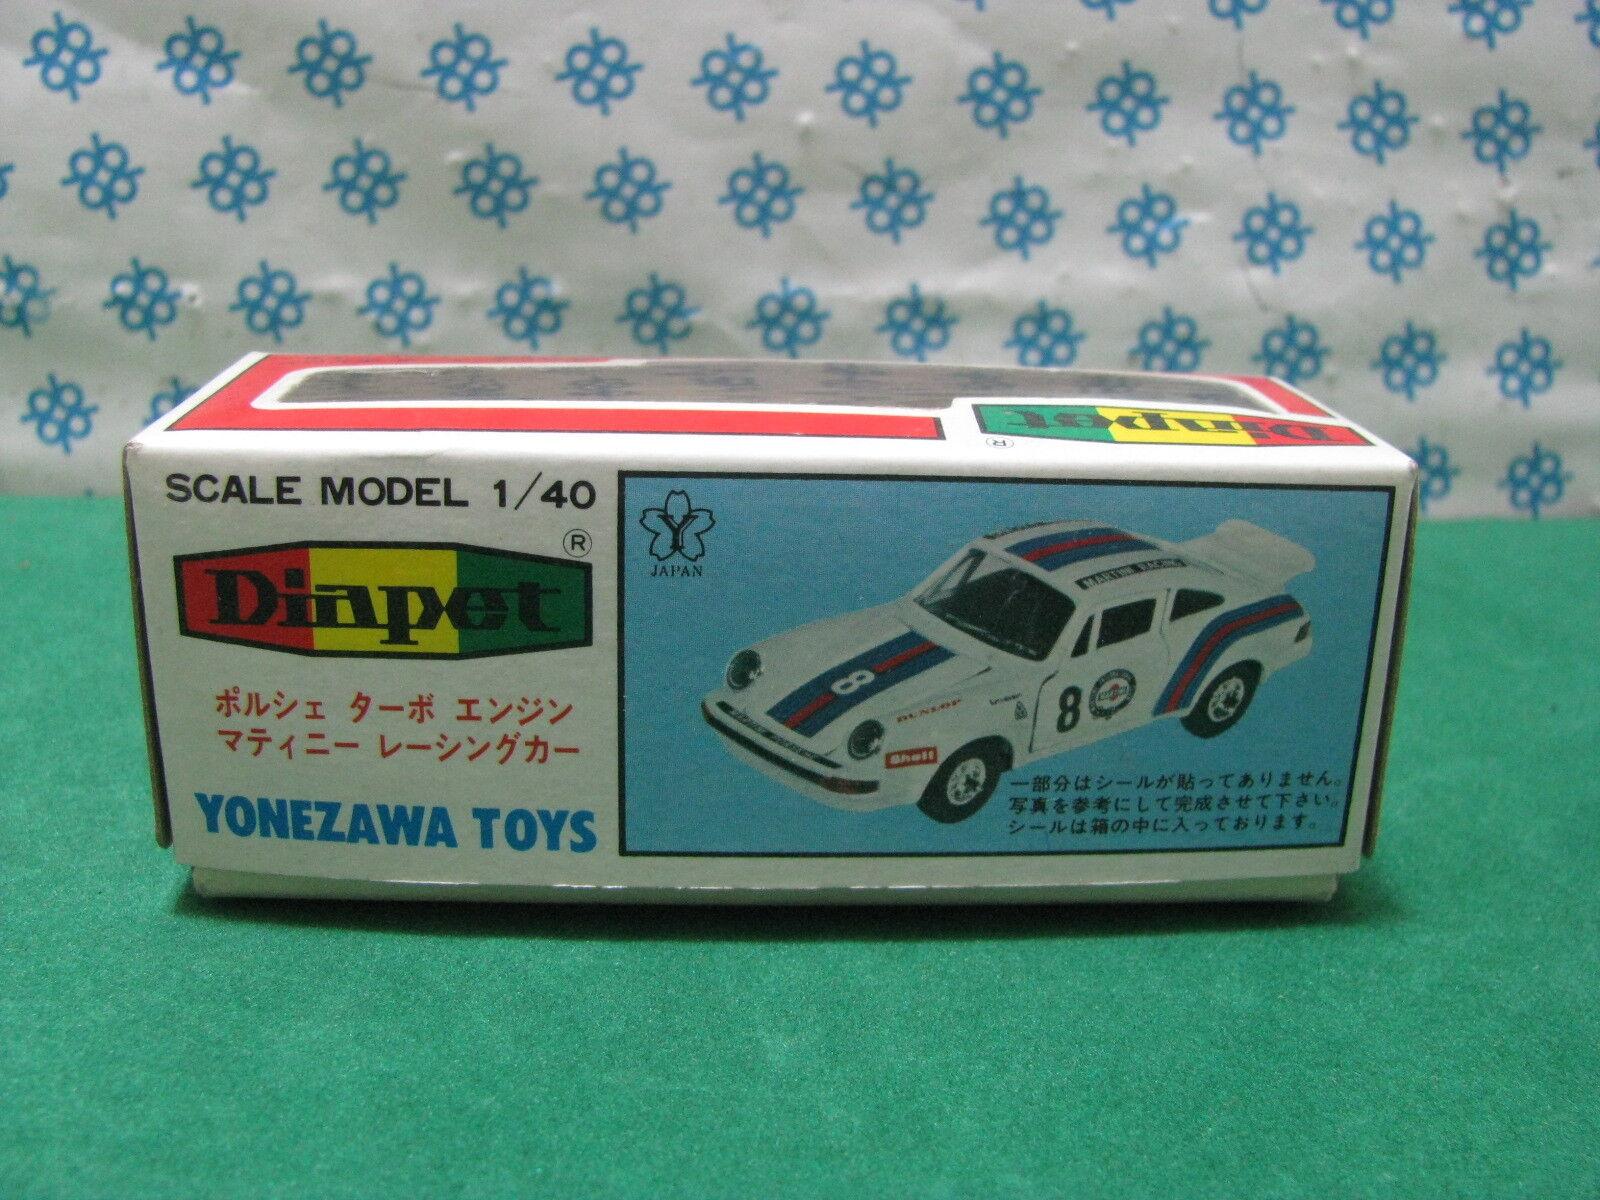 Box Box For for Porsche 911 Turbo Martini - 1 40 Diapet-Yonezawa Toys